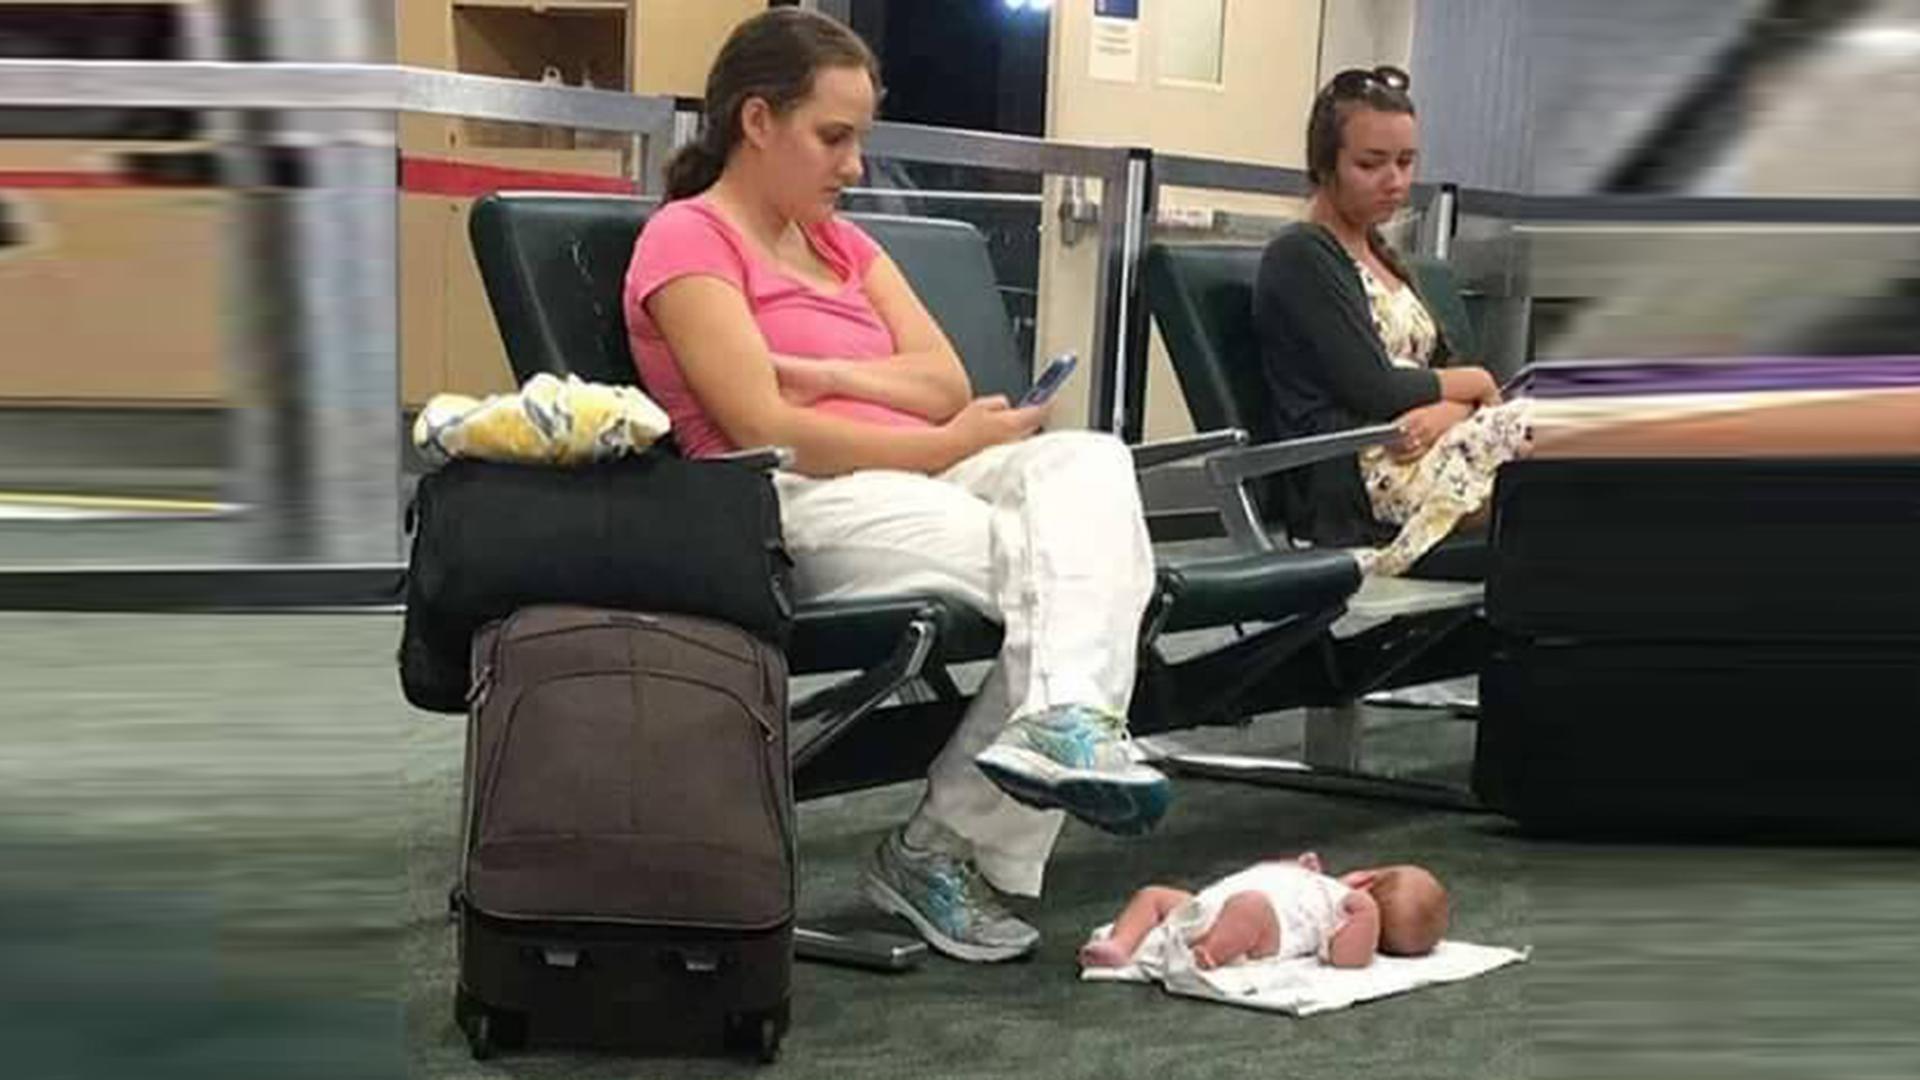 Baby Food Carry On Flight